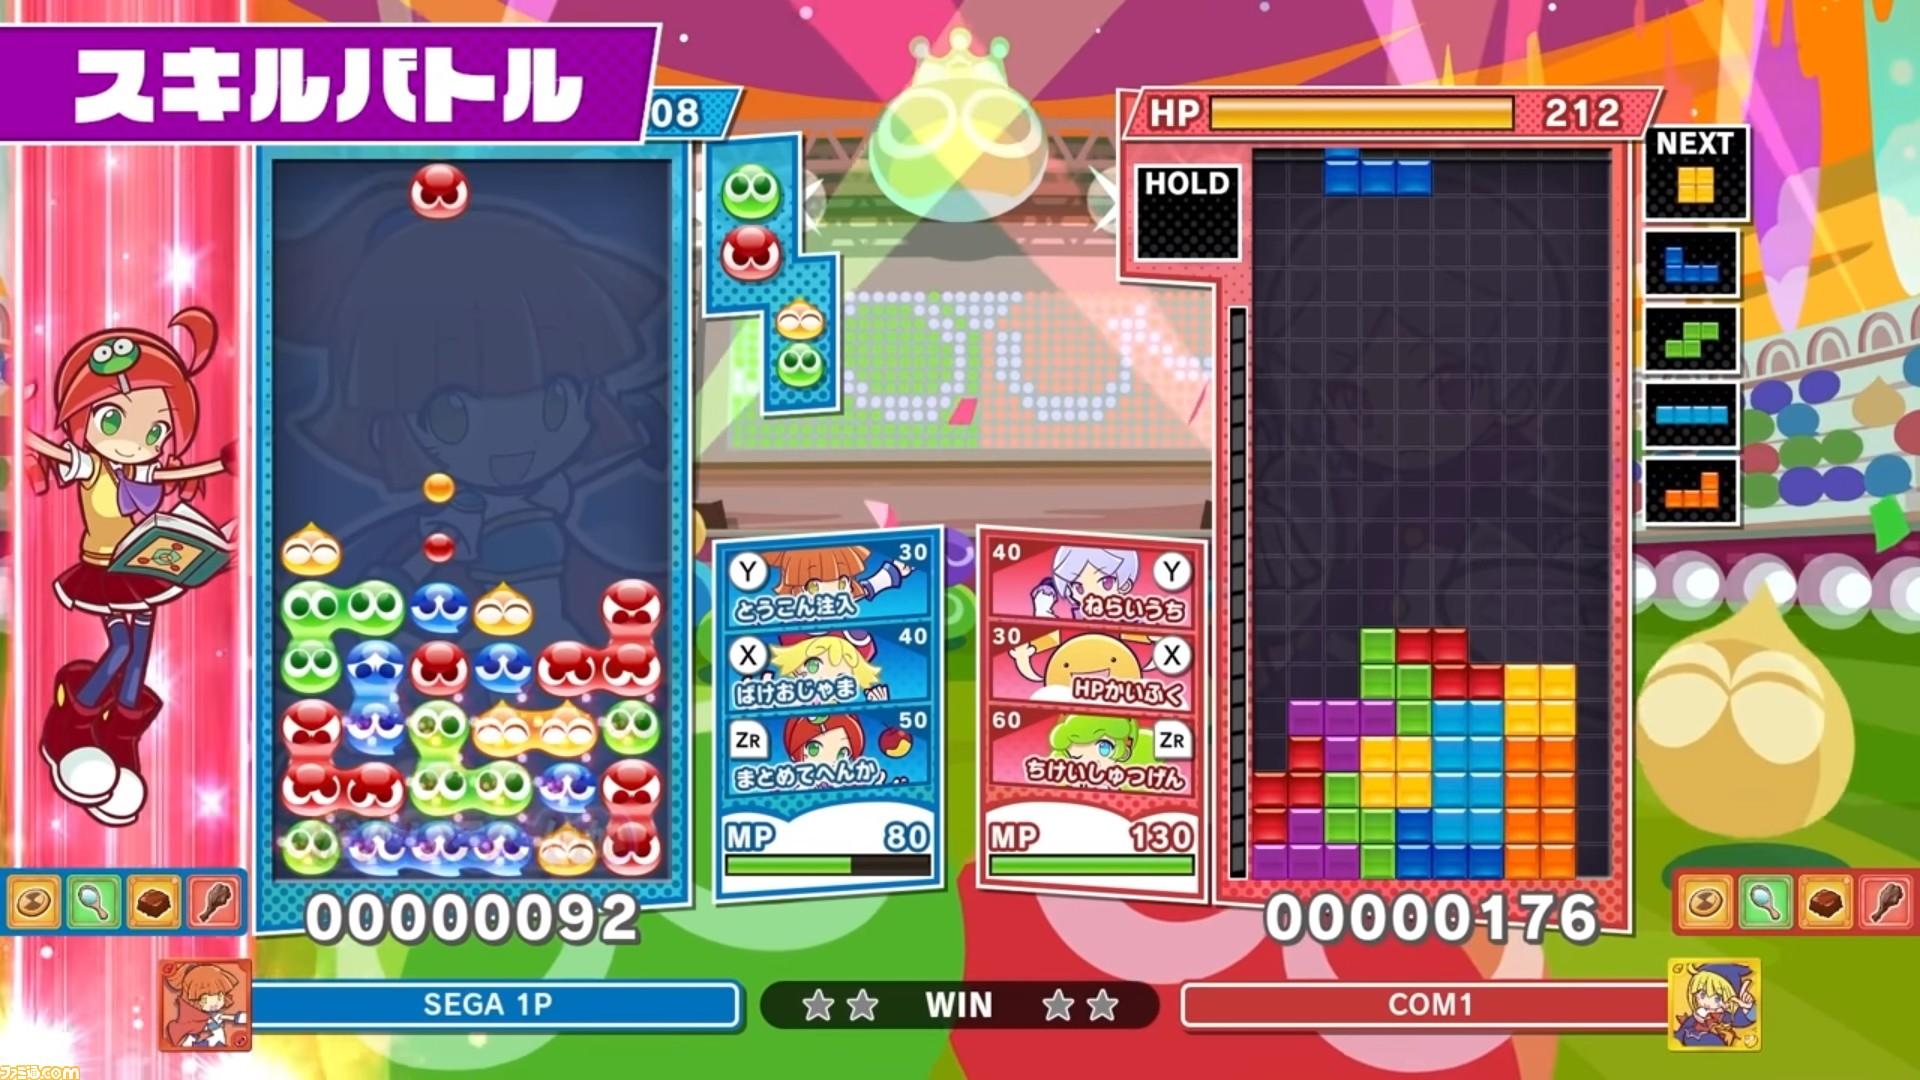 hd puyo puyo tetris 2 wallpaper 72493